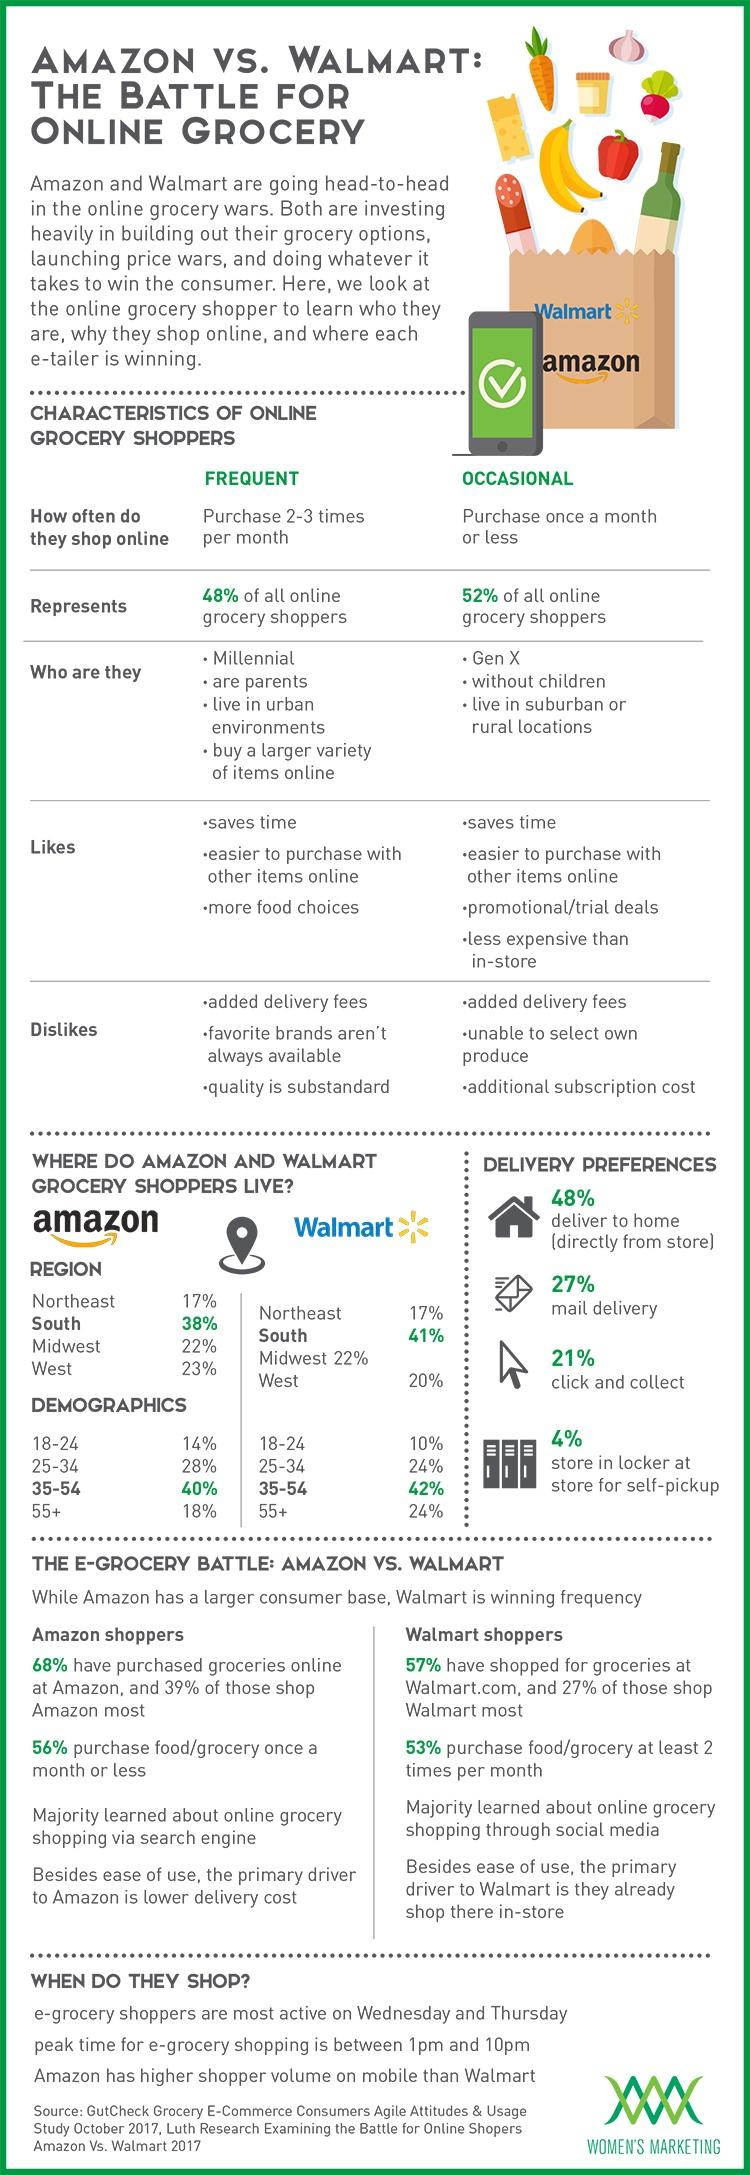 AmazonVSWalmart_OnlineGrocery_Infographic